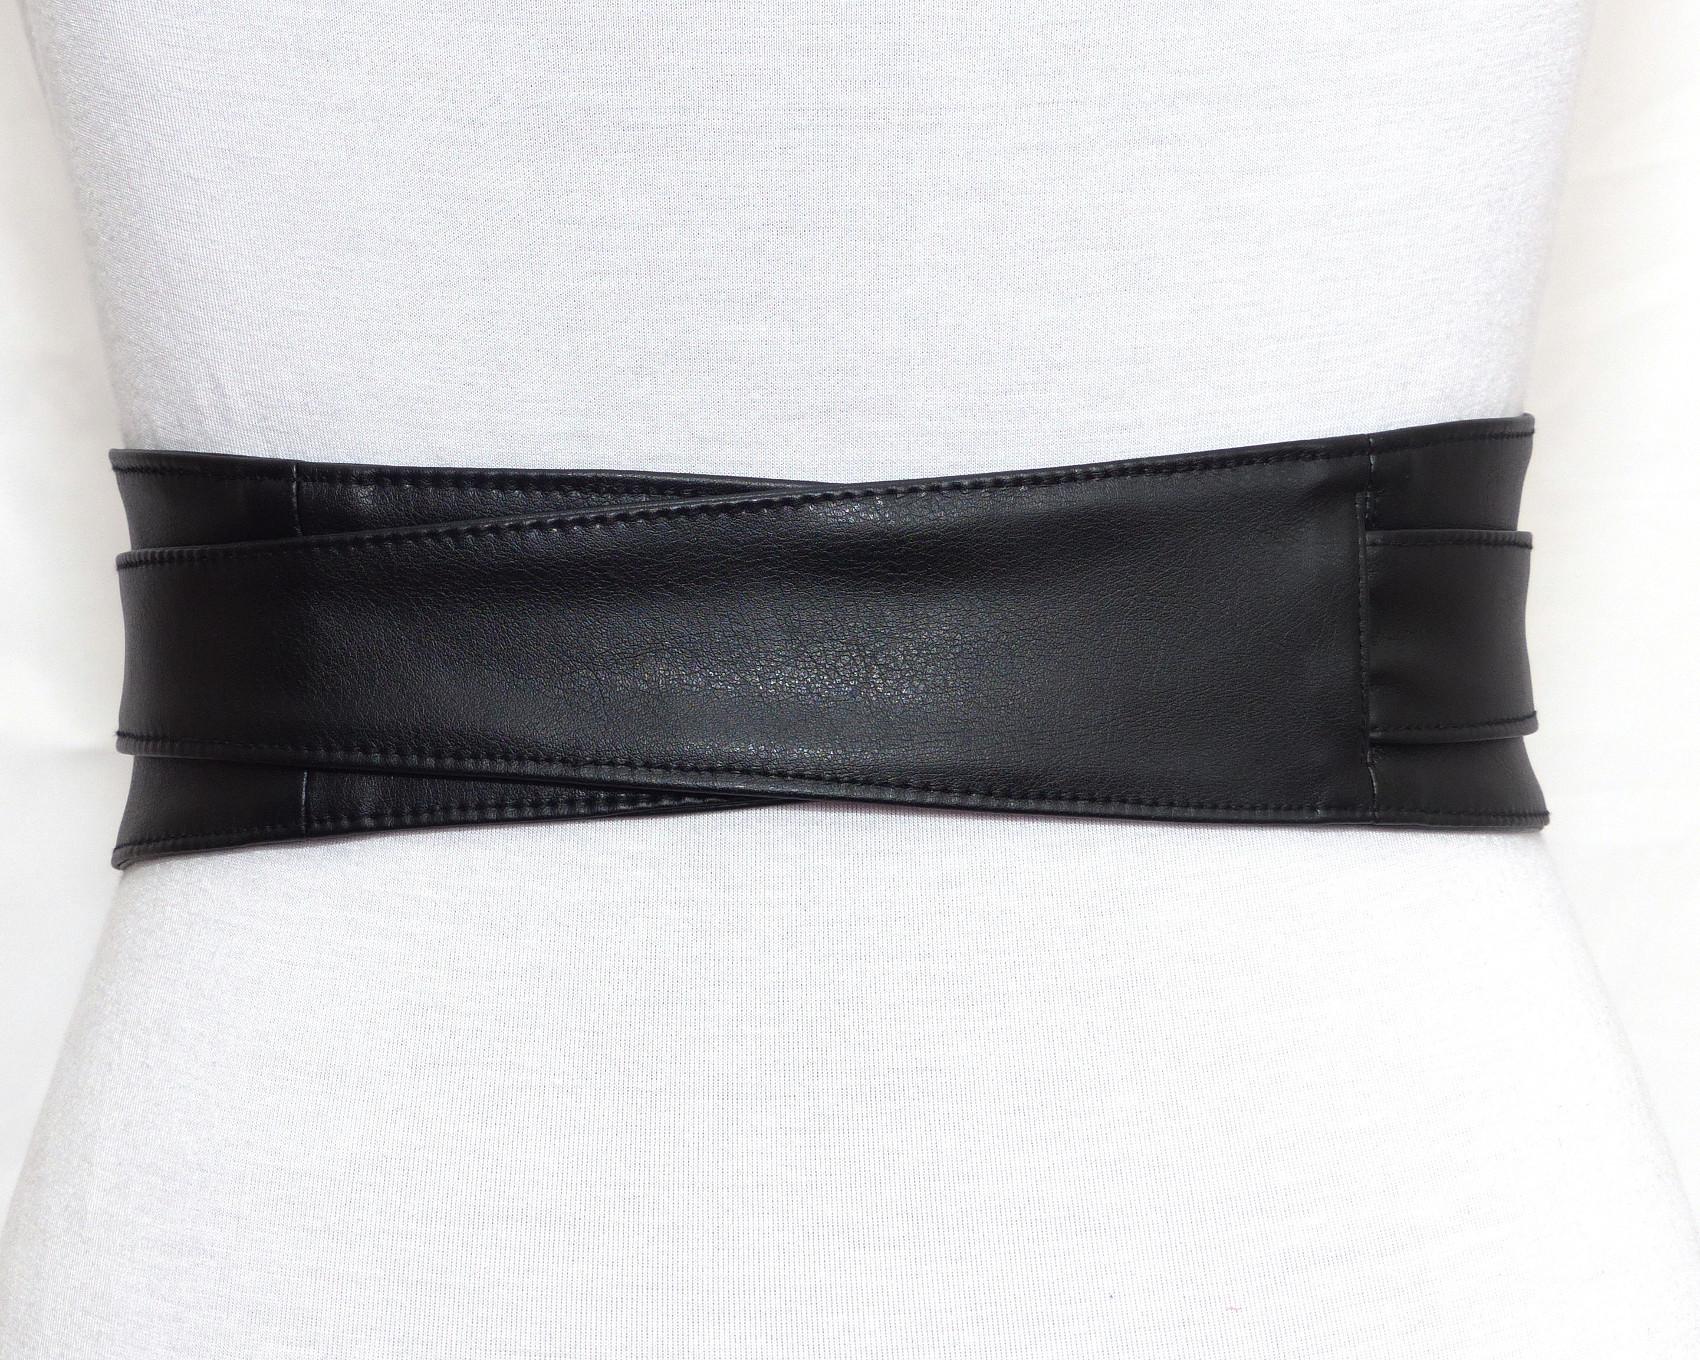 Ceinture Obi Cuir Noir à nouer – Polina Couture 4ae1b823425